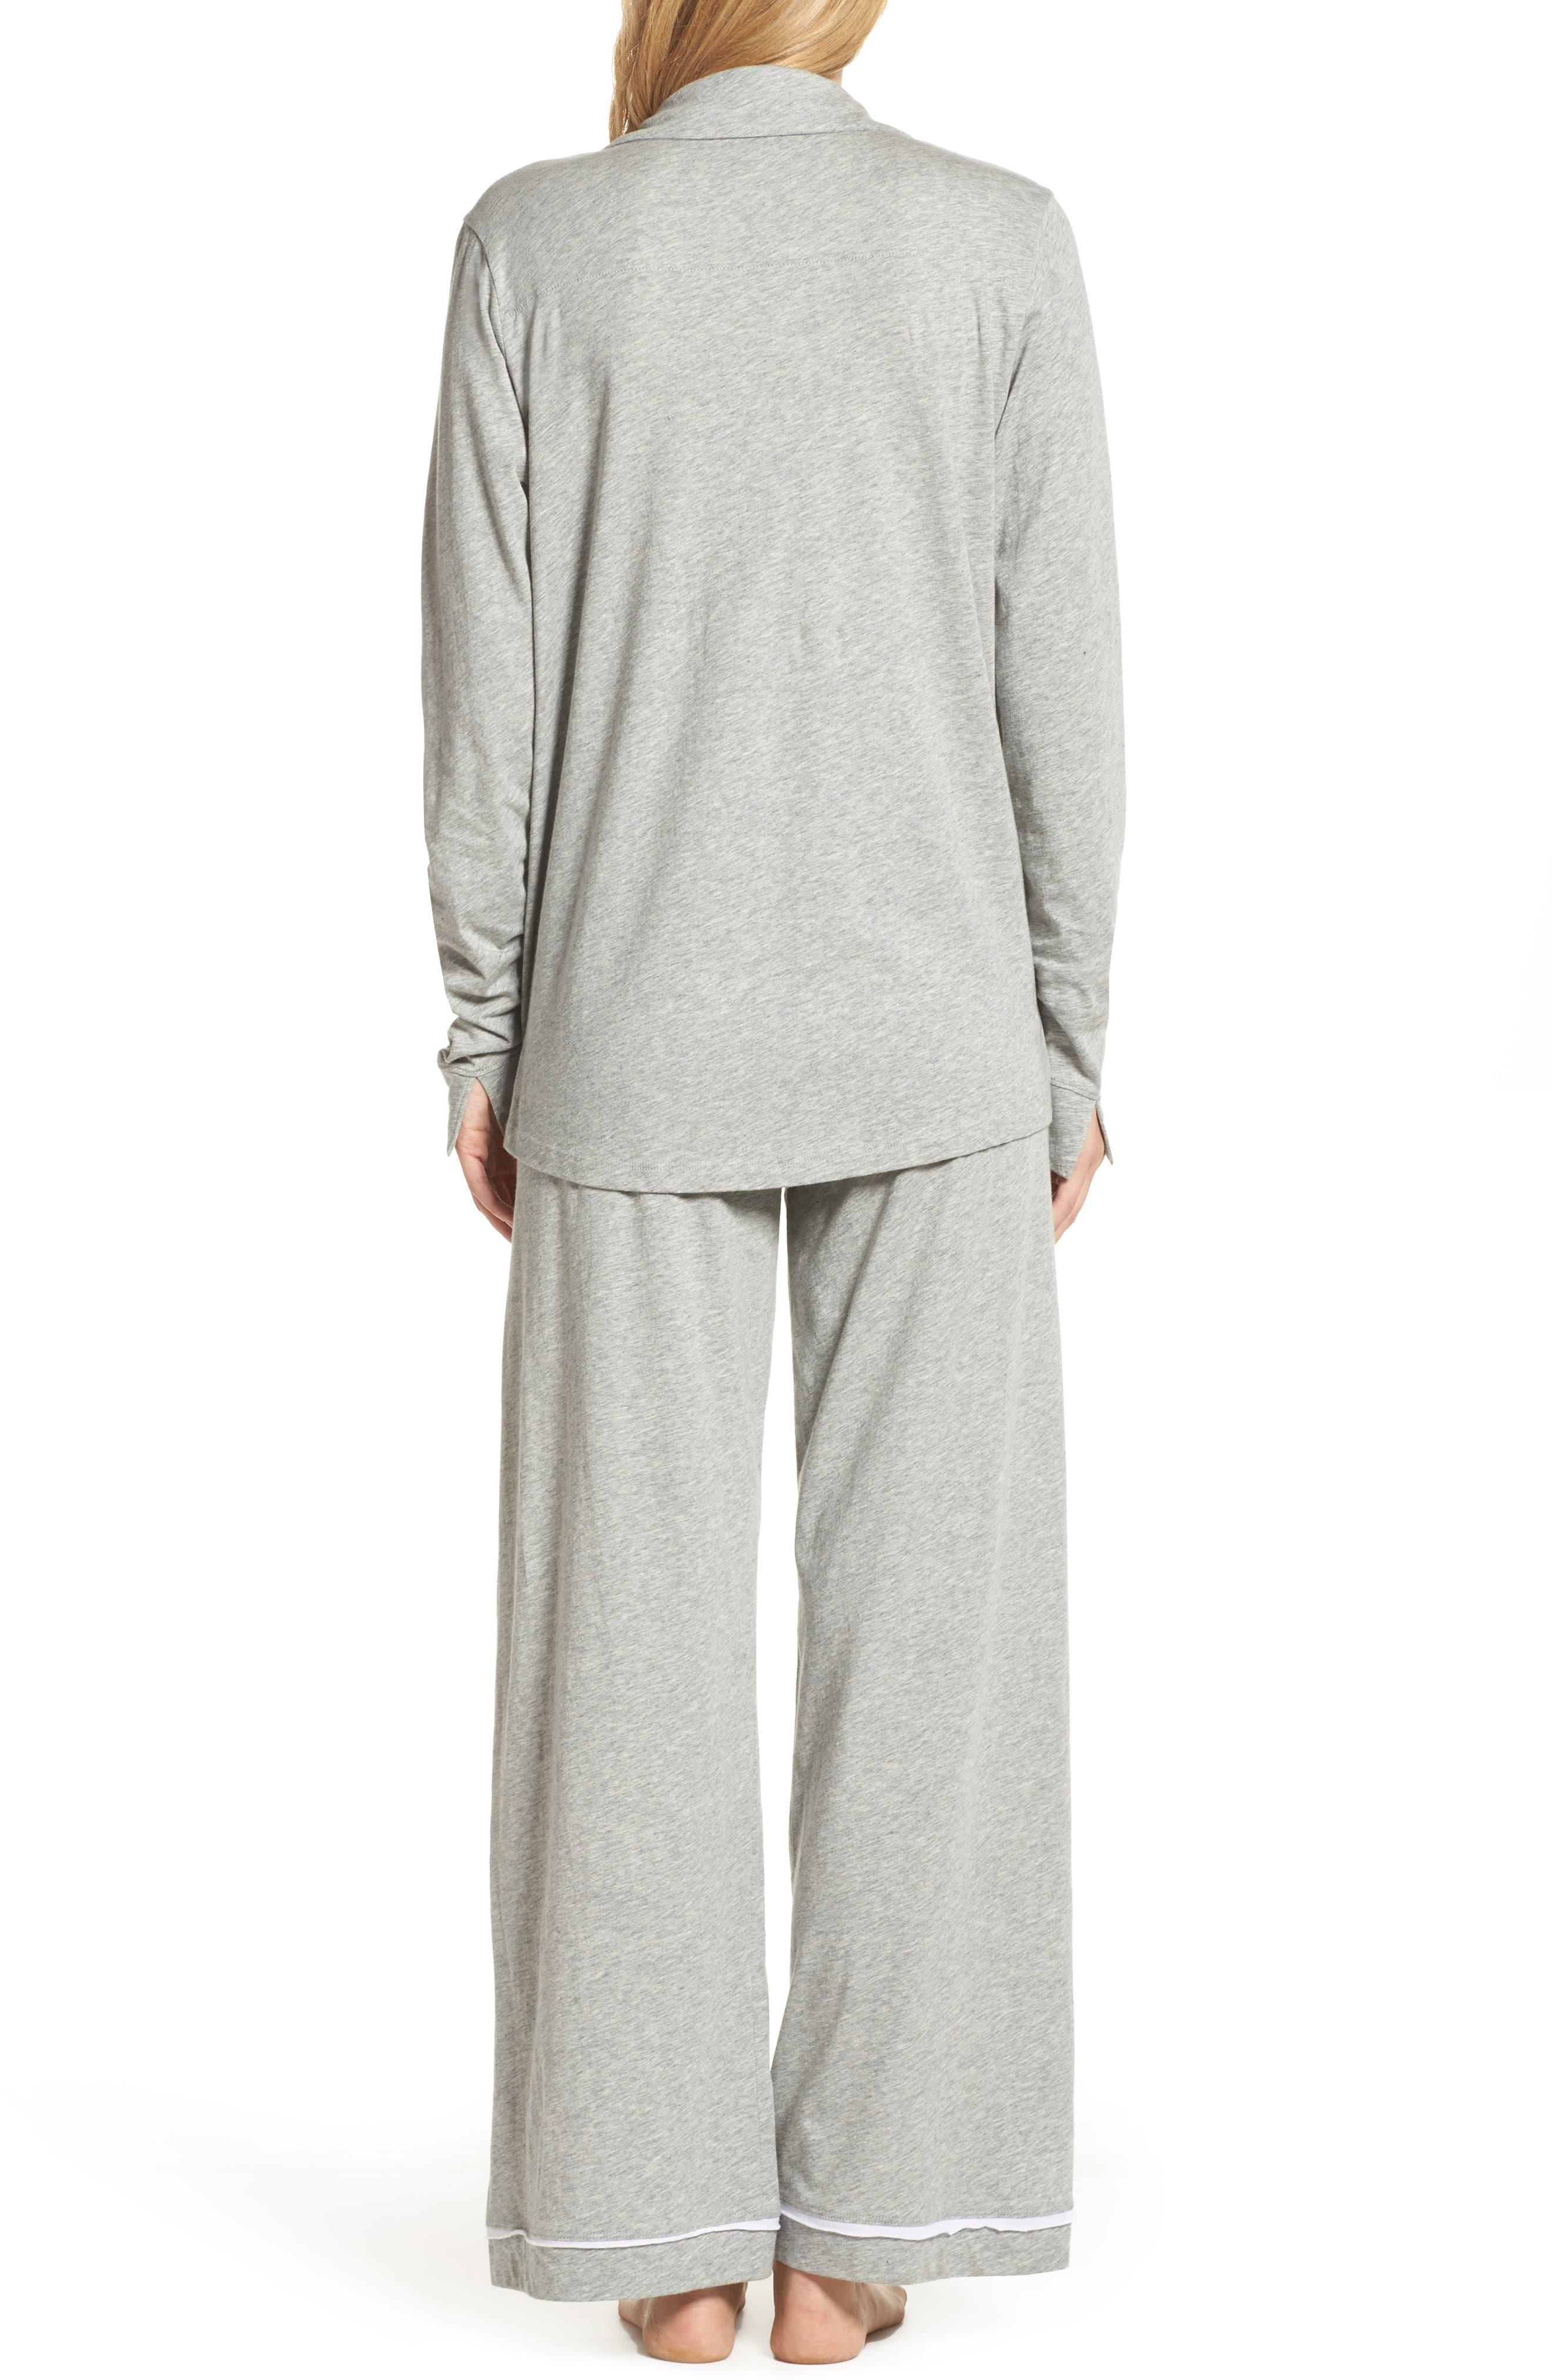 Penelope Pima Cotton Pajamas,                             Alternate thumbnail 2, color,                             020